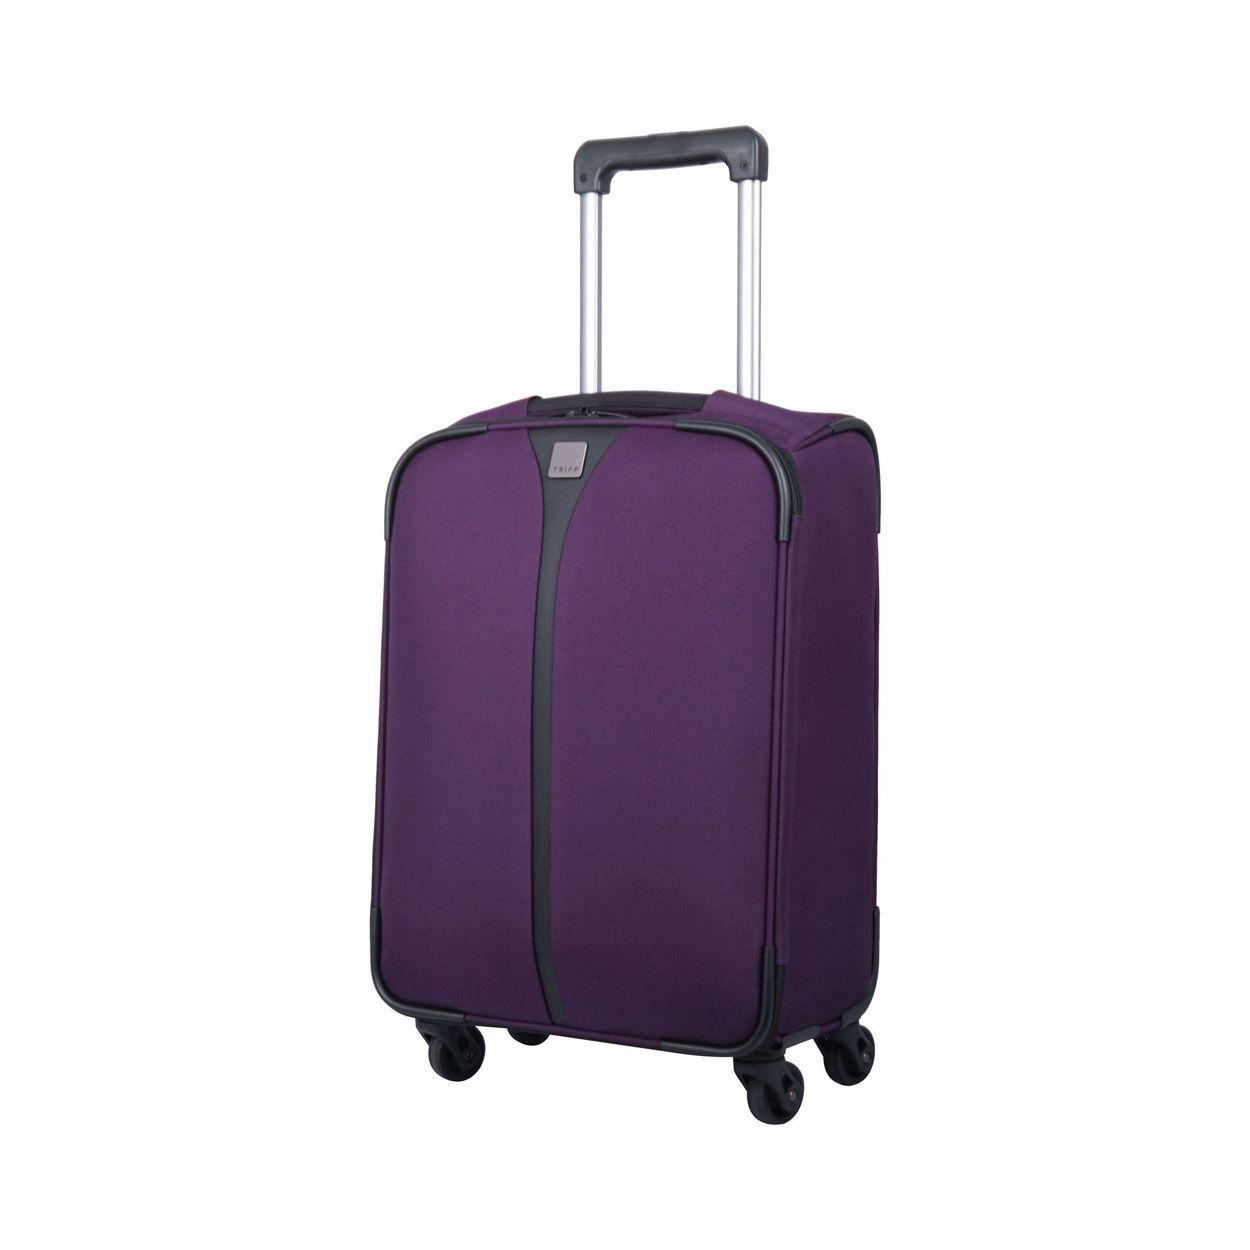 The Tripp Superlite 4-Wheel Cabin Suitcase in Cassis is Tripps ...